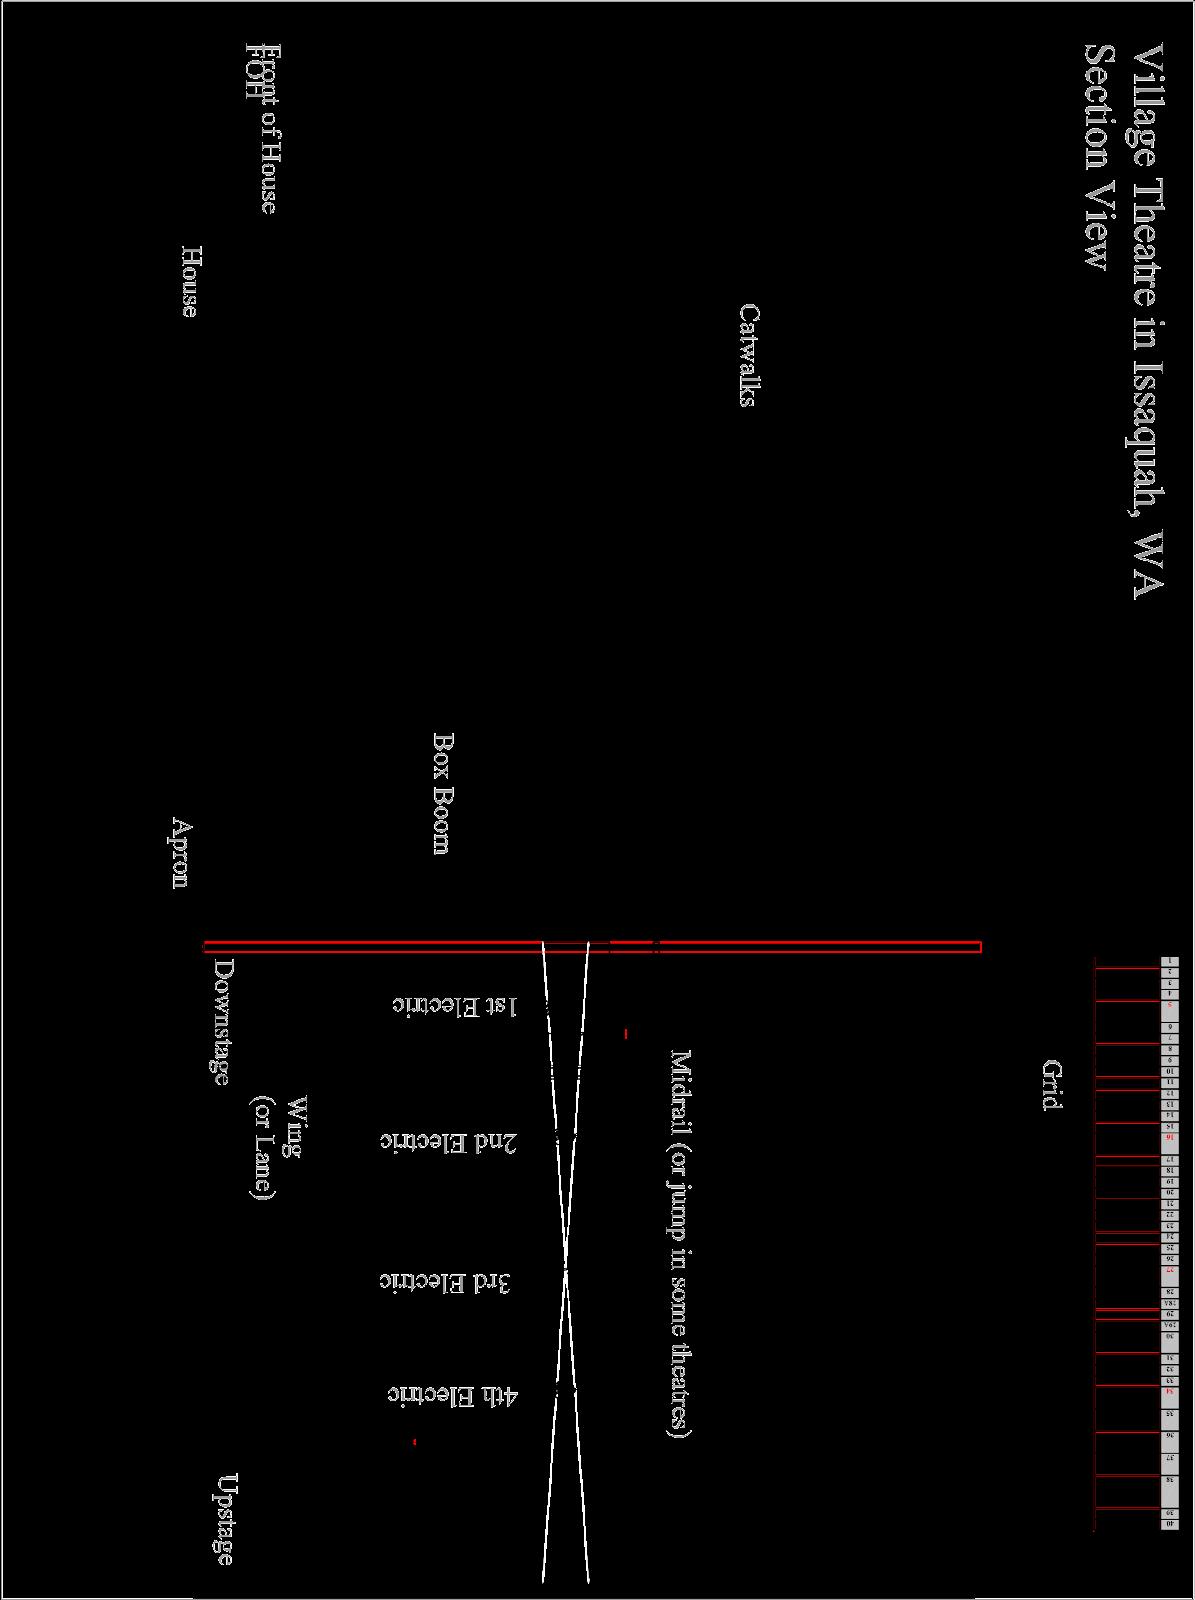 Diagram, text, schematic  Description automatically generated